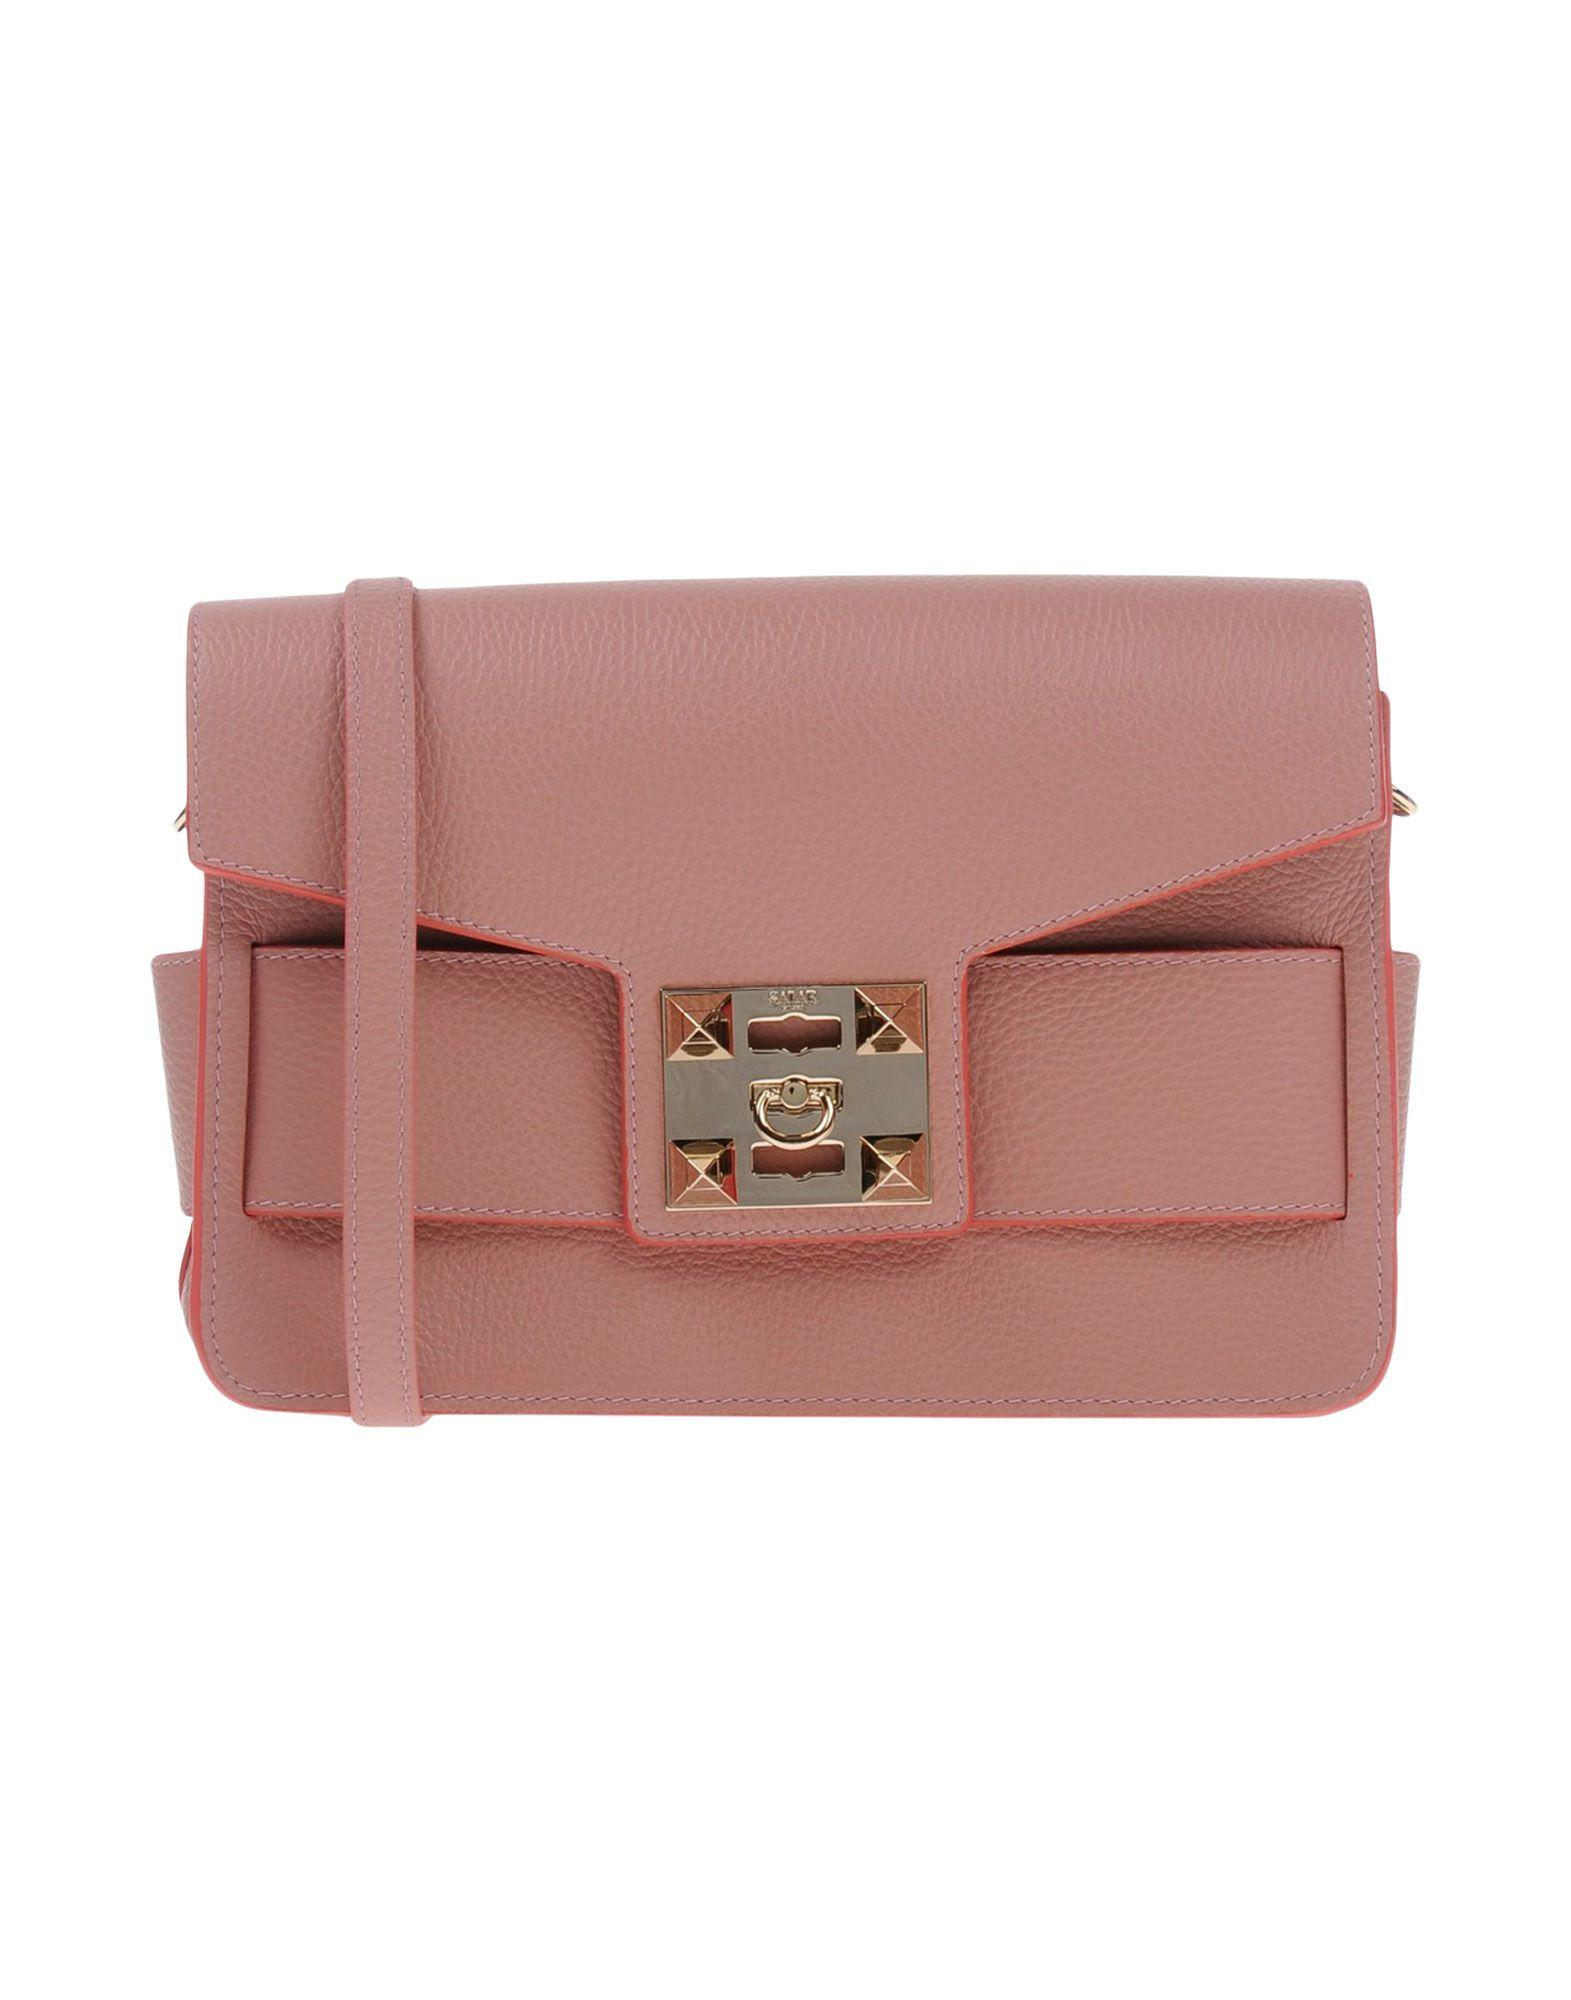 Salar Handbag In Pastel Pink